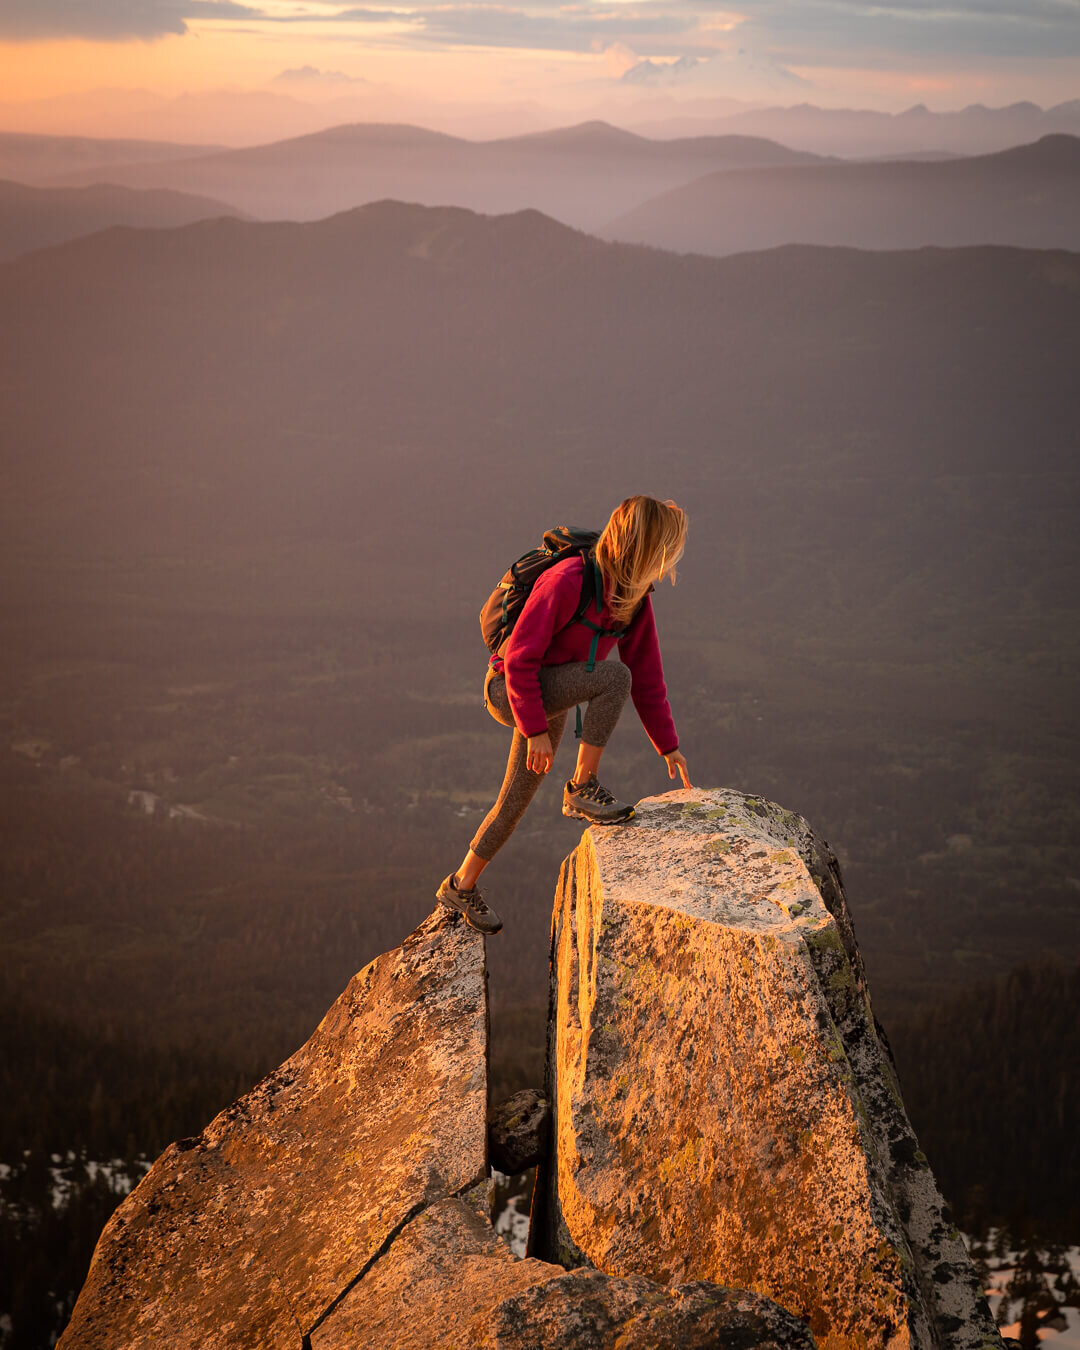 Mount Pilchuck in Washington. Photo by  Kyle Kotajarvi